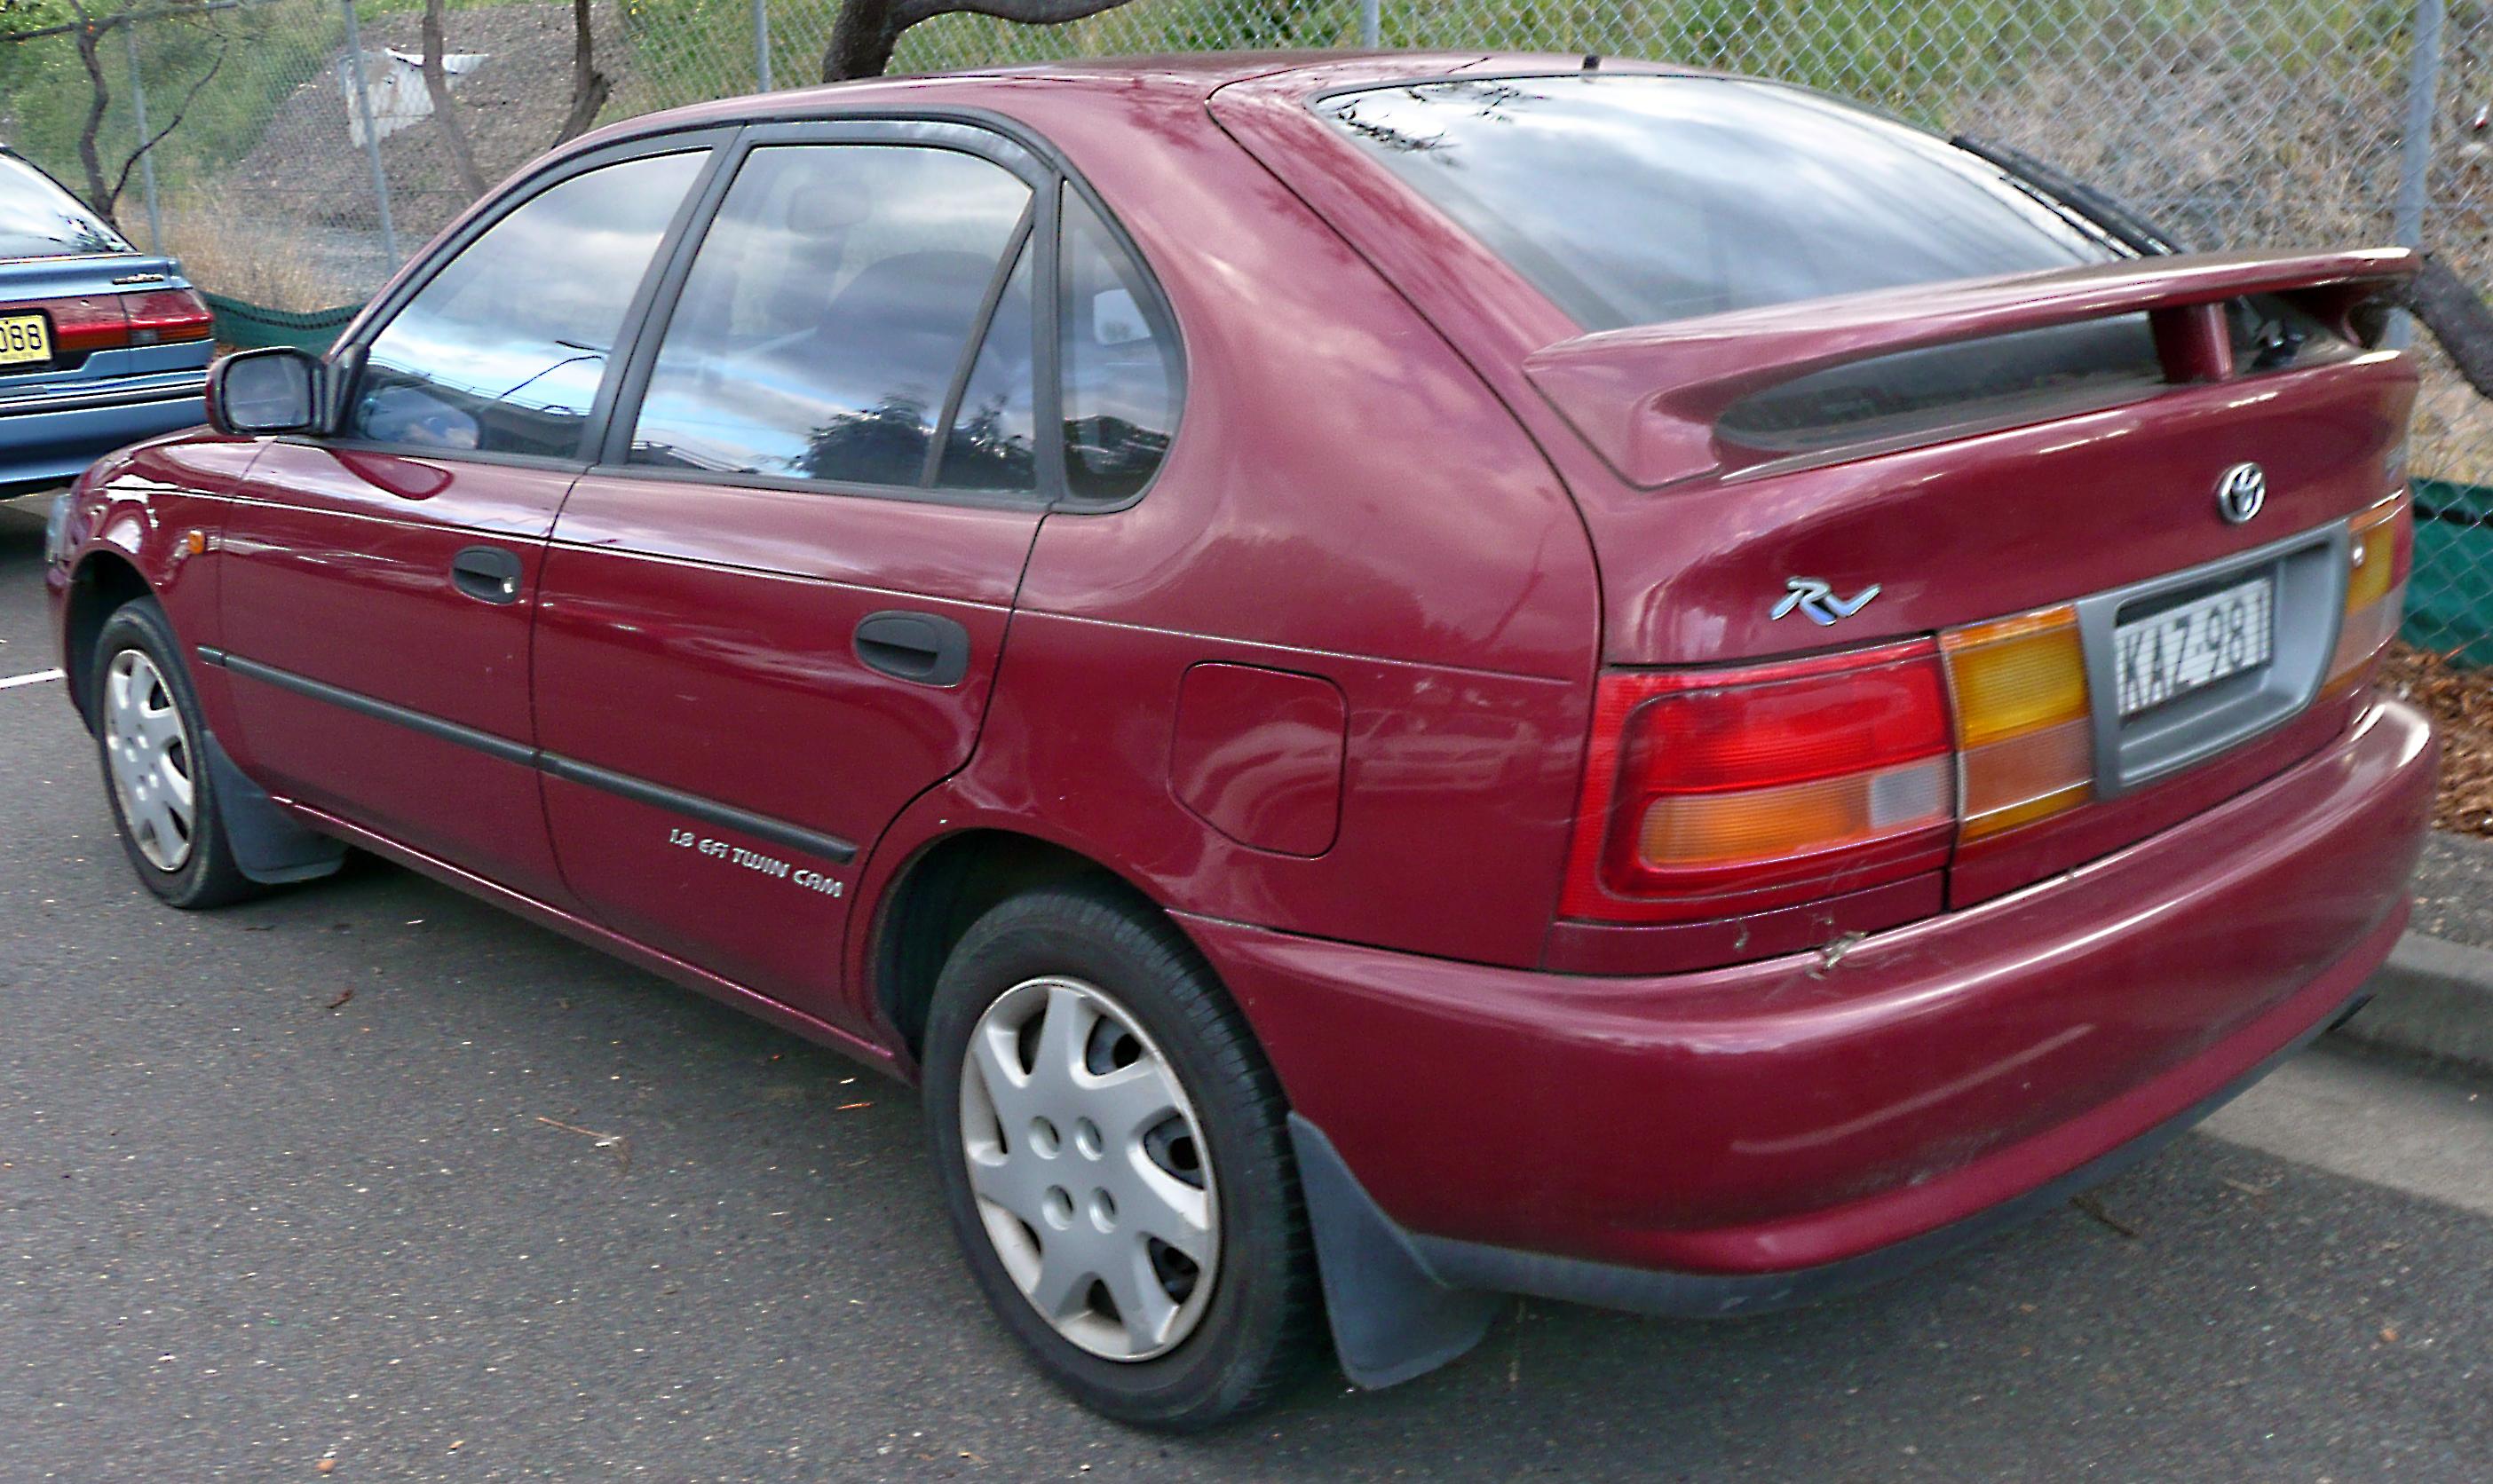 File:1996-1998 Toyota Corolla (AE102R) RV Seca 5-door